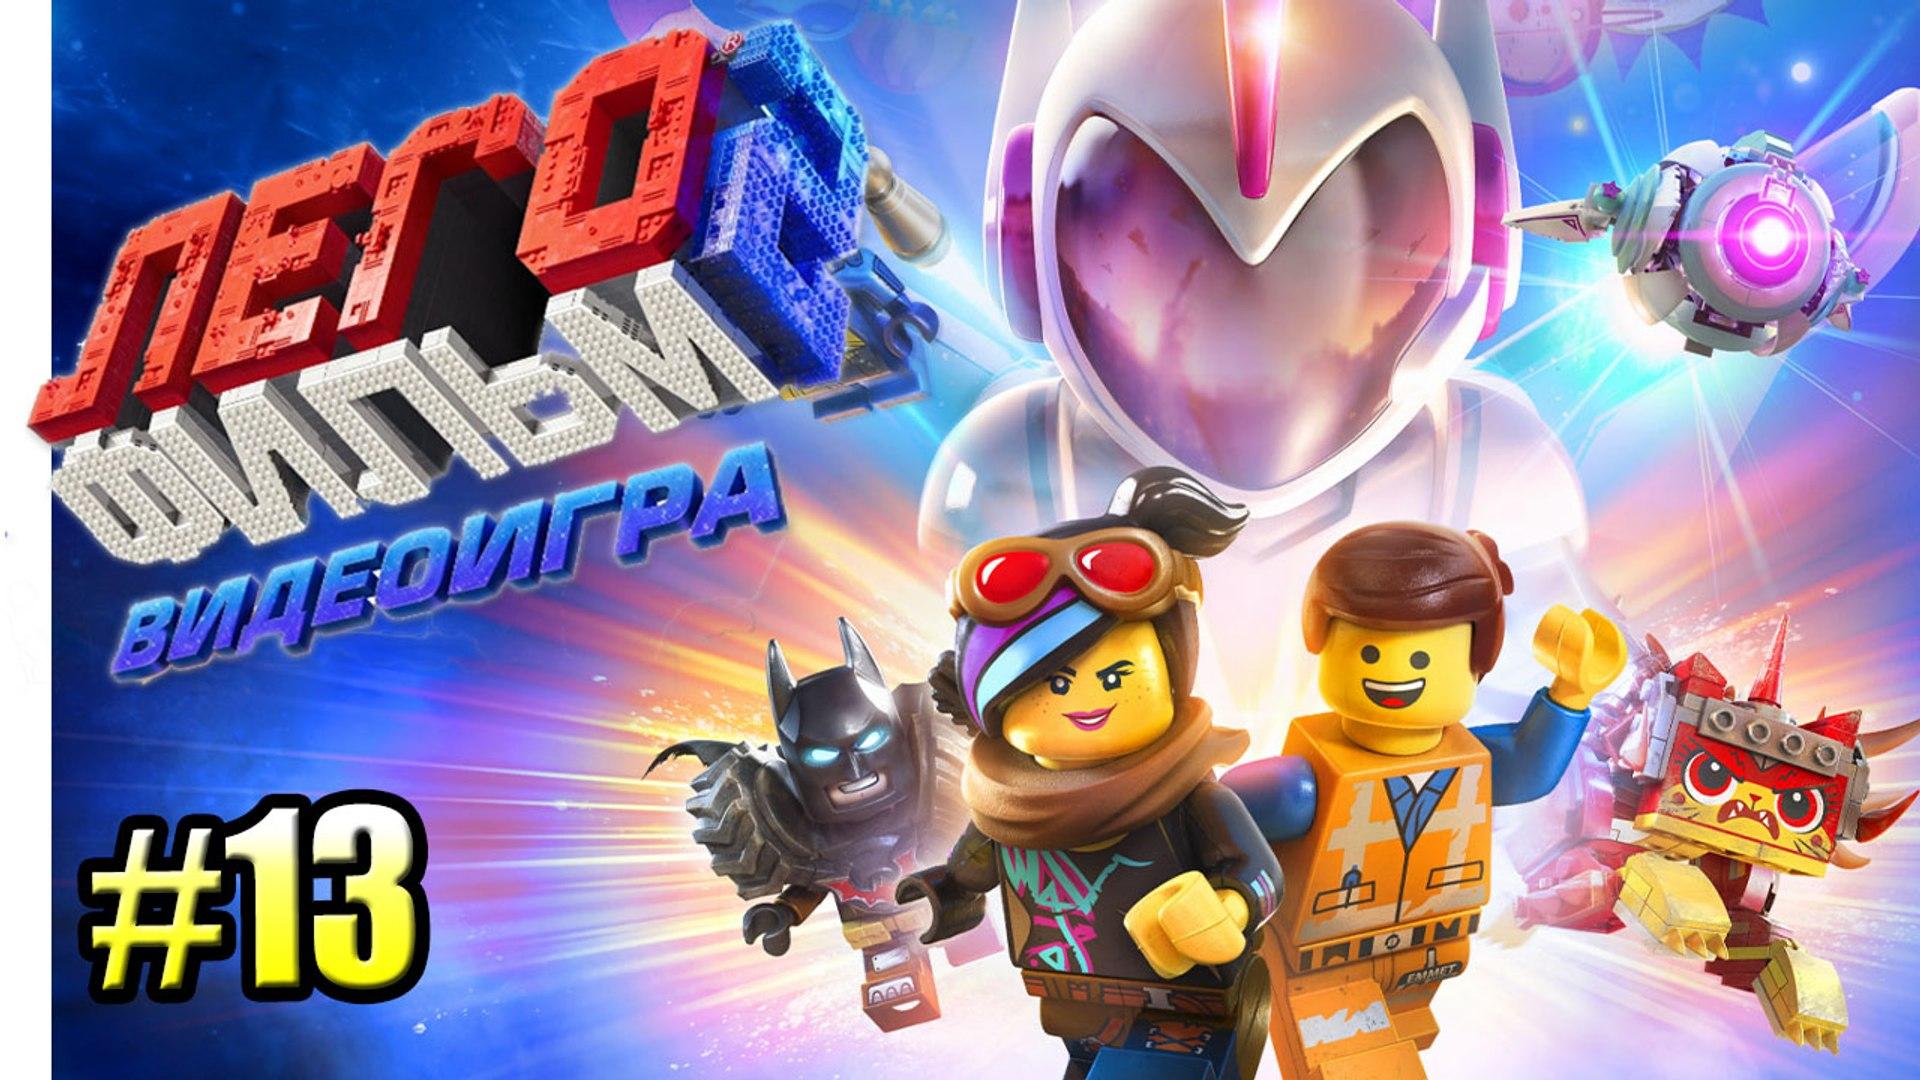 The LEGO Movie 2 Videogame прохождение #13 на русском {PC}